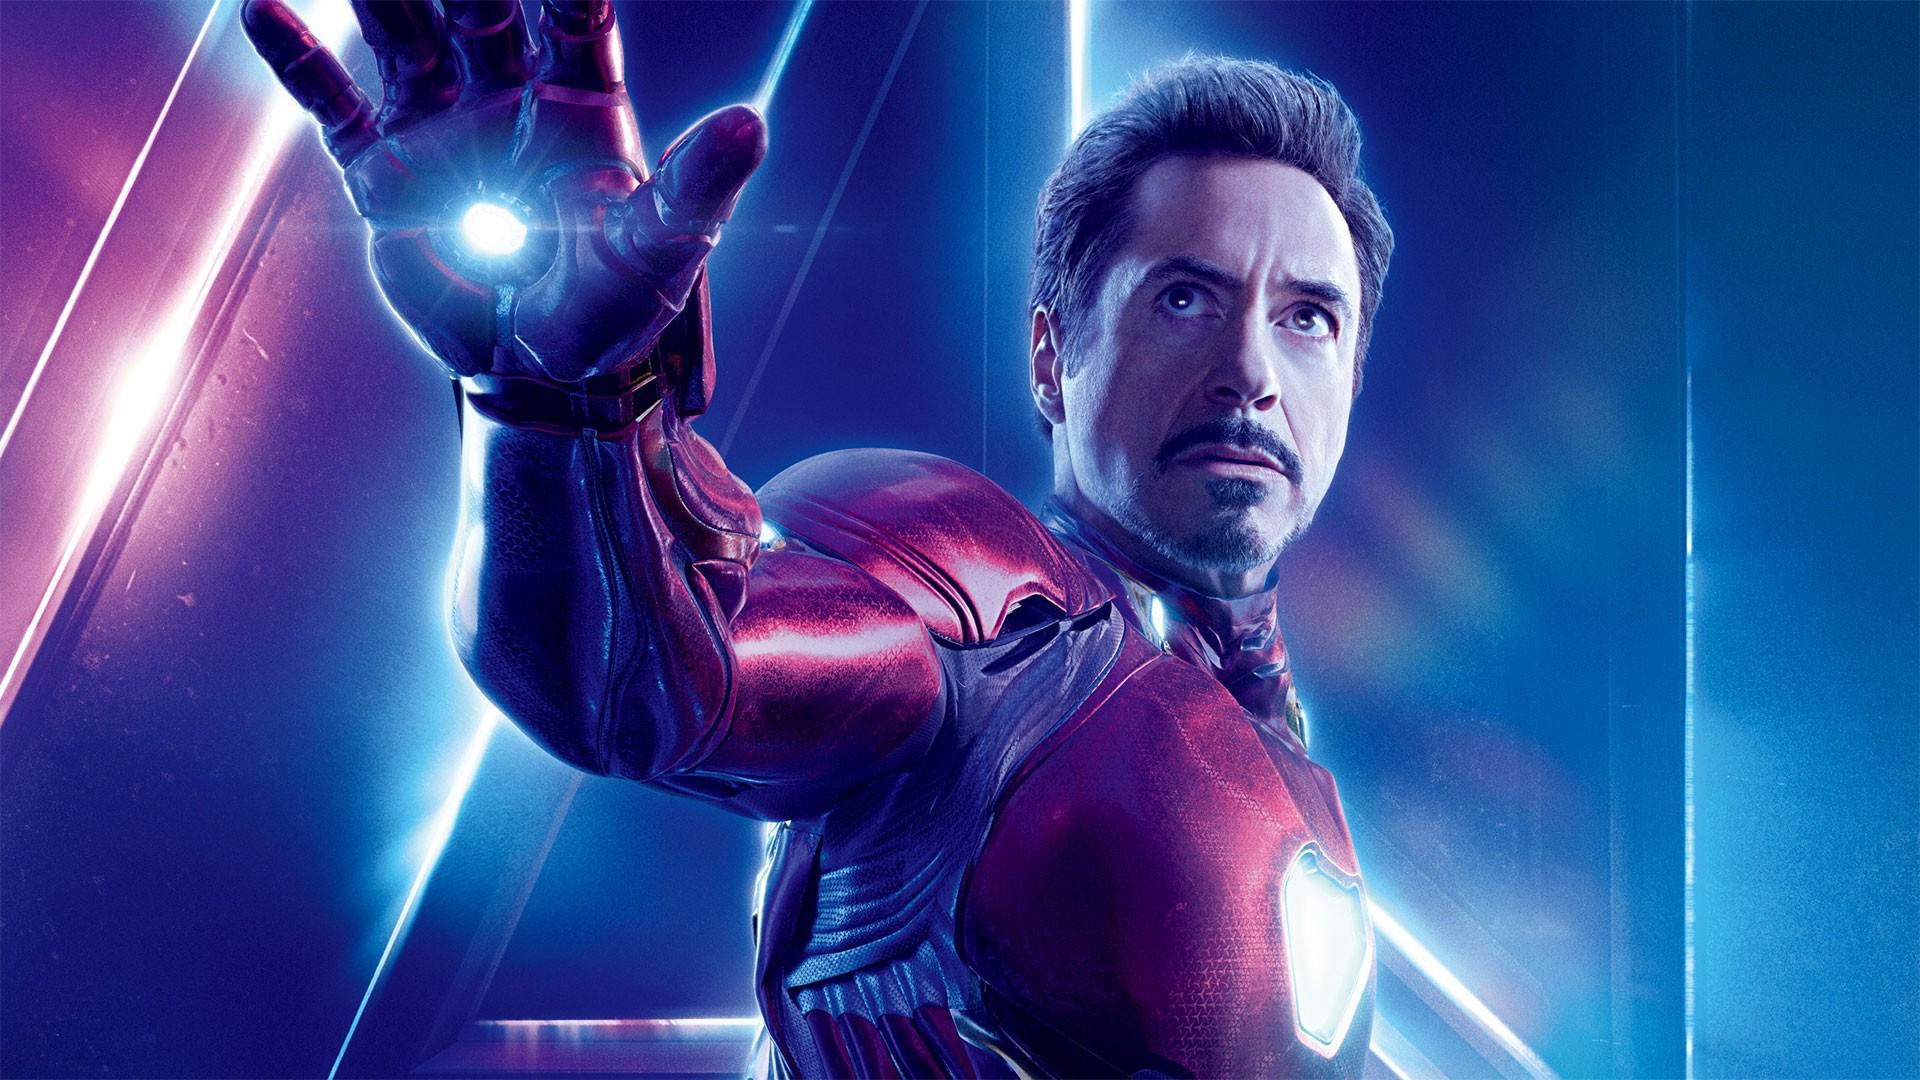 Avengers Endgame Time Stone K X Ultra Hd Wallpaperrhuhdwallpaperseu